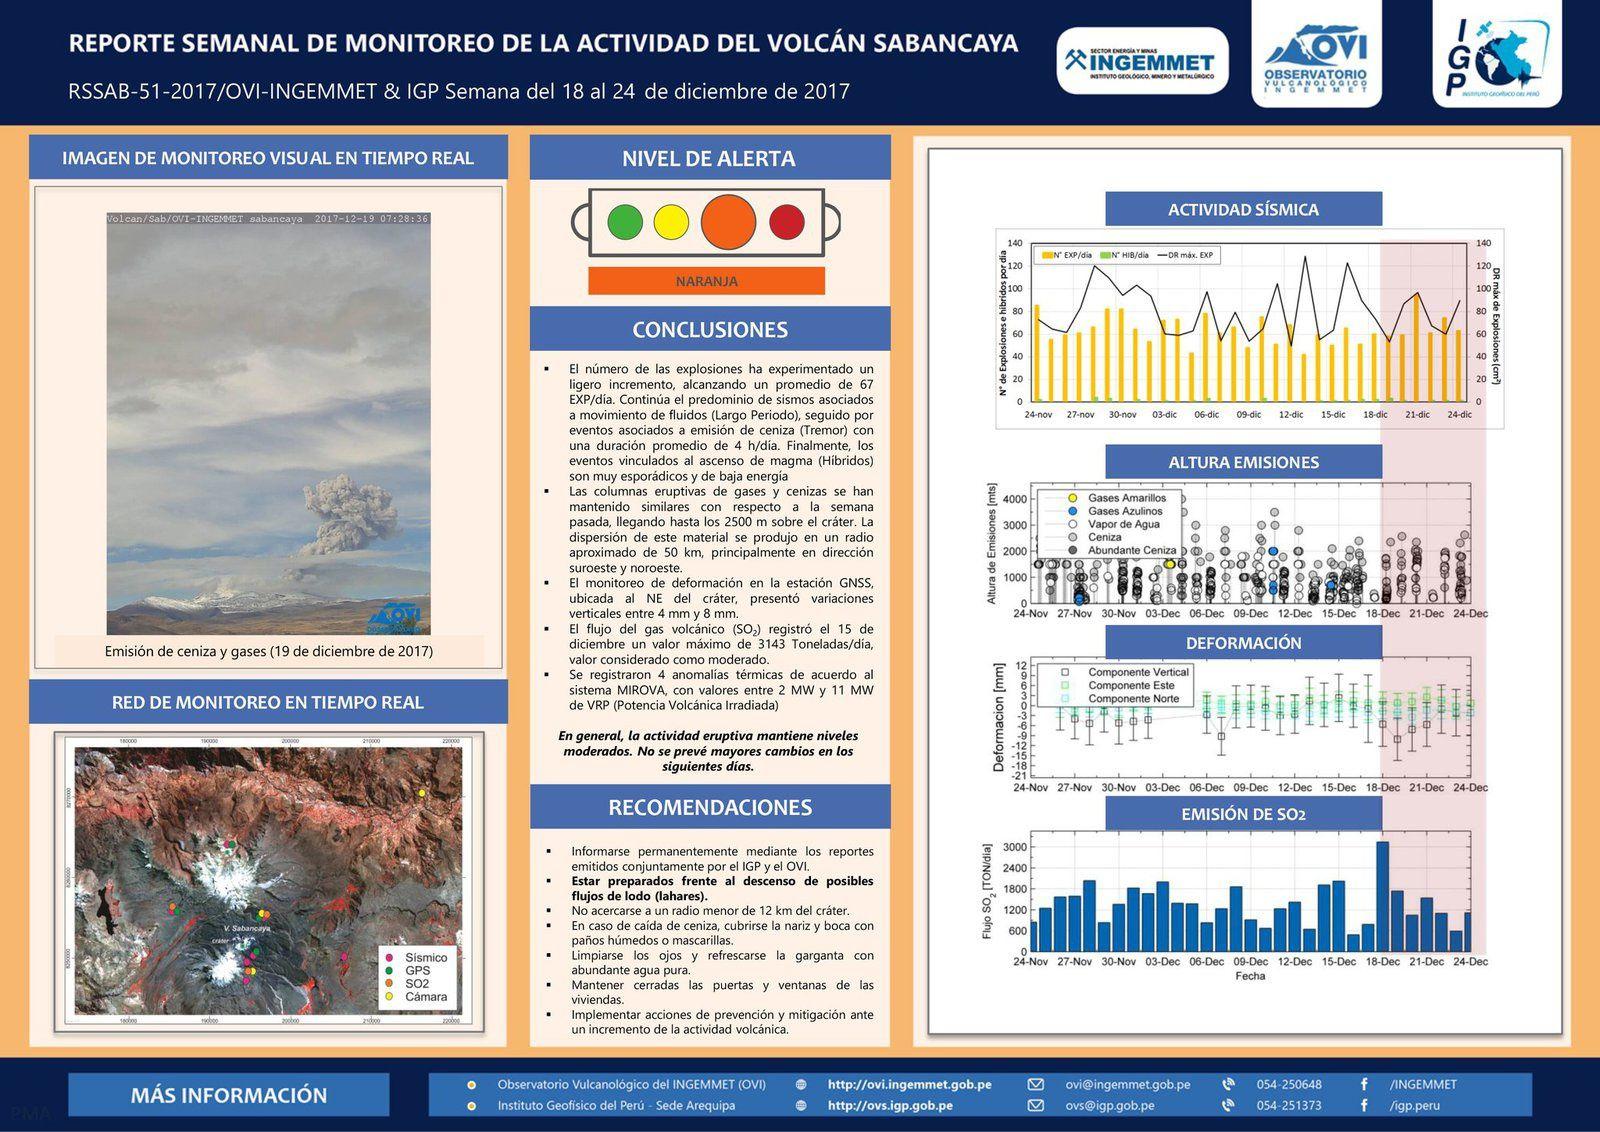 Sabancaya - summary of the activity from 18 to 24 December 2017 - Doc. IG Peru / OVI / Ingemmet